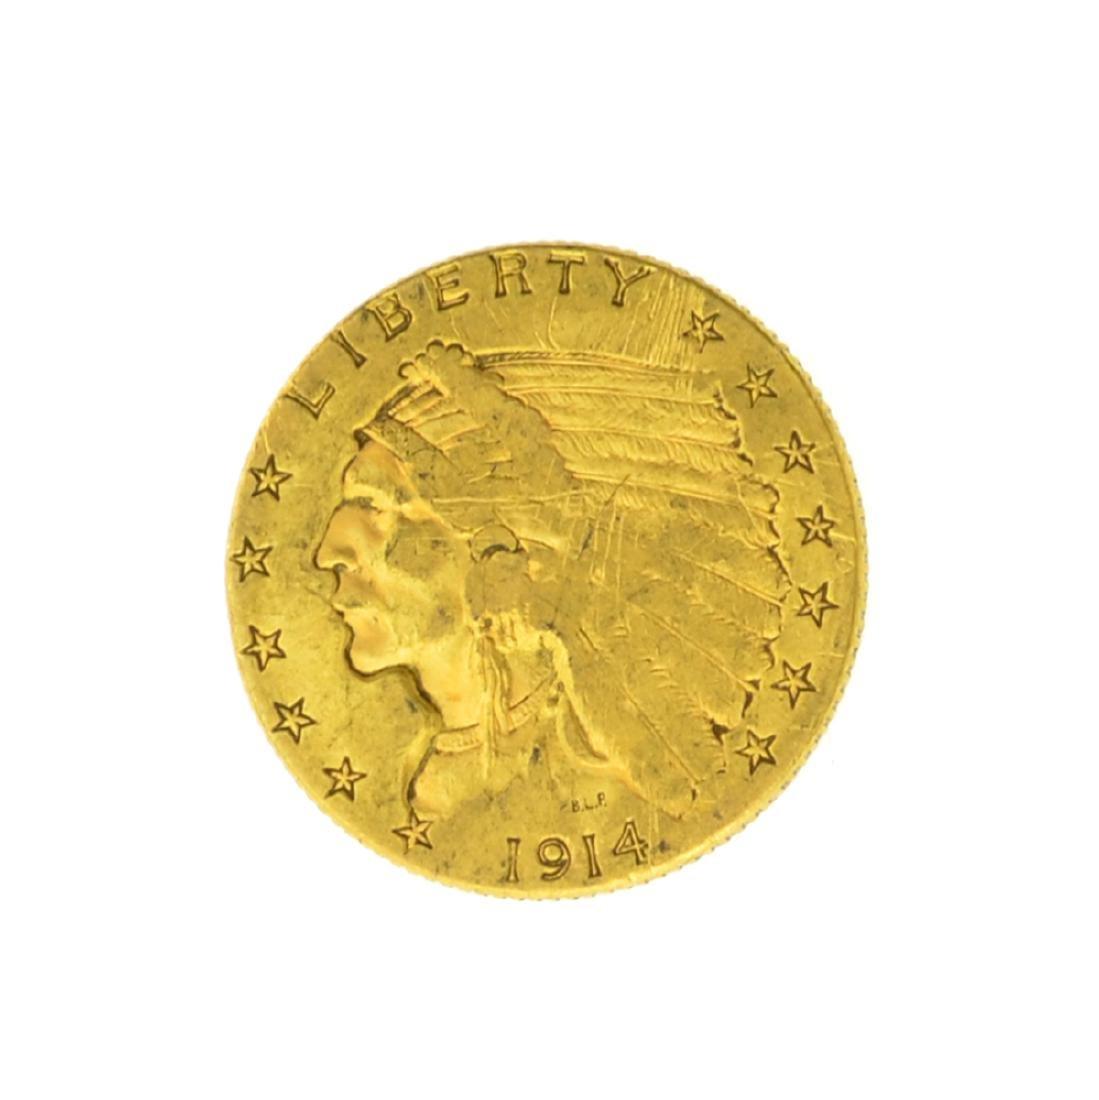 *1914 $2.50 U.S. Indian Head Gold Coin (JG)